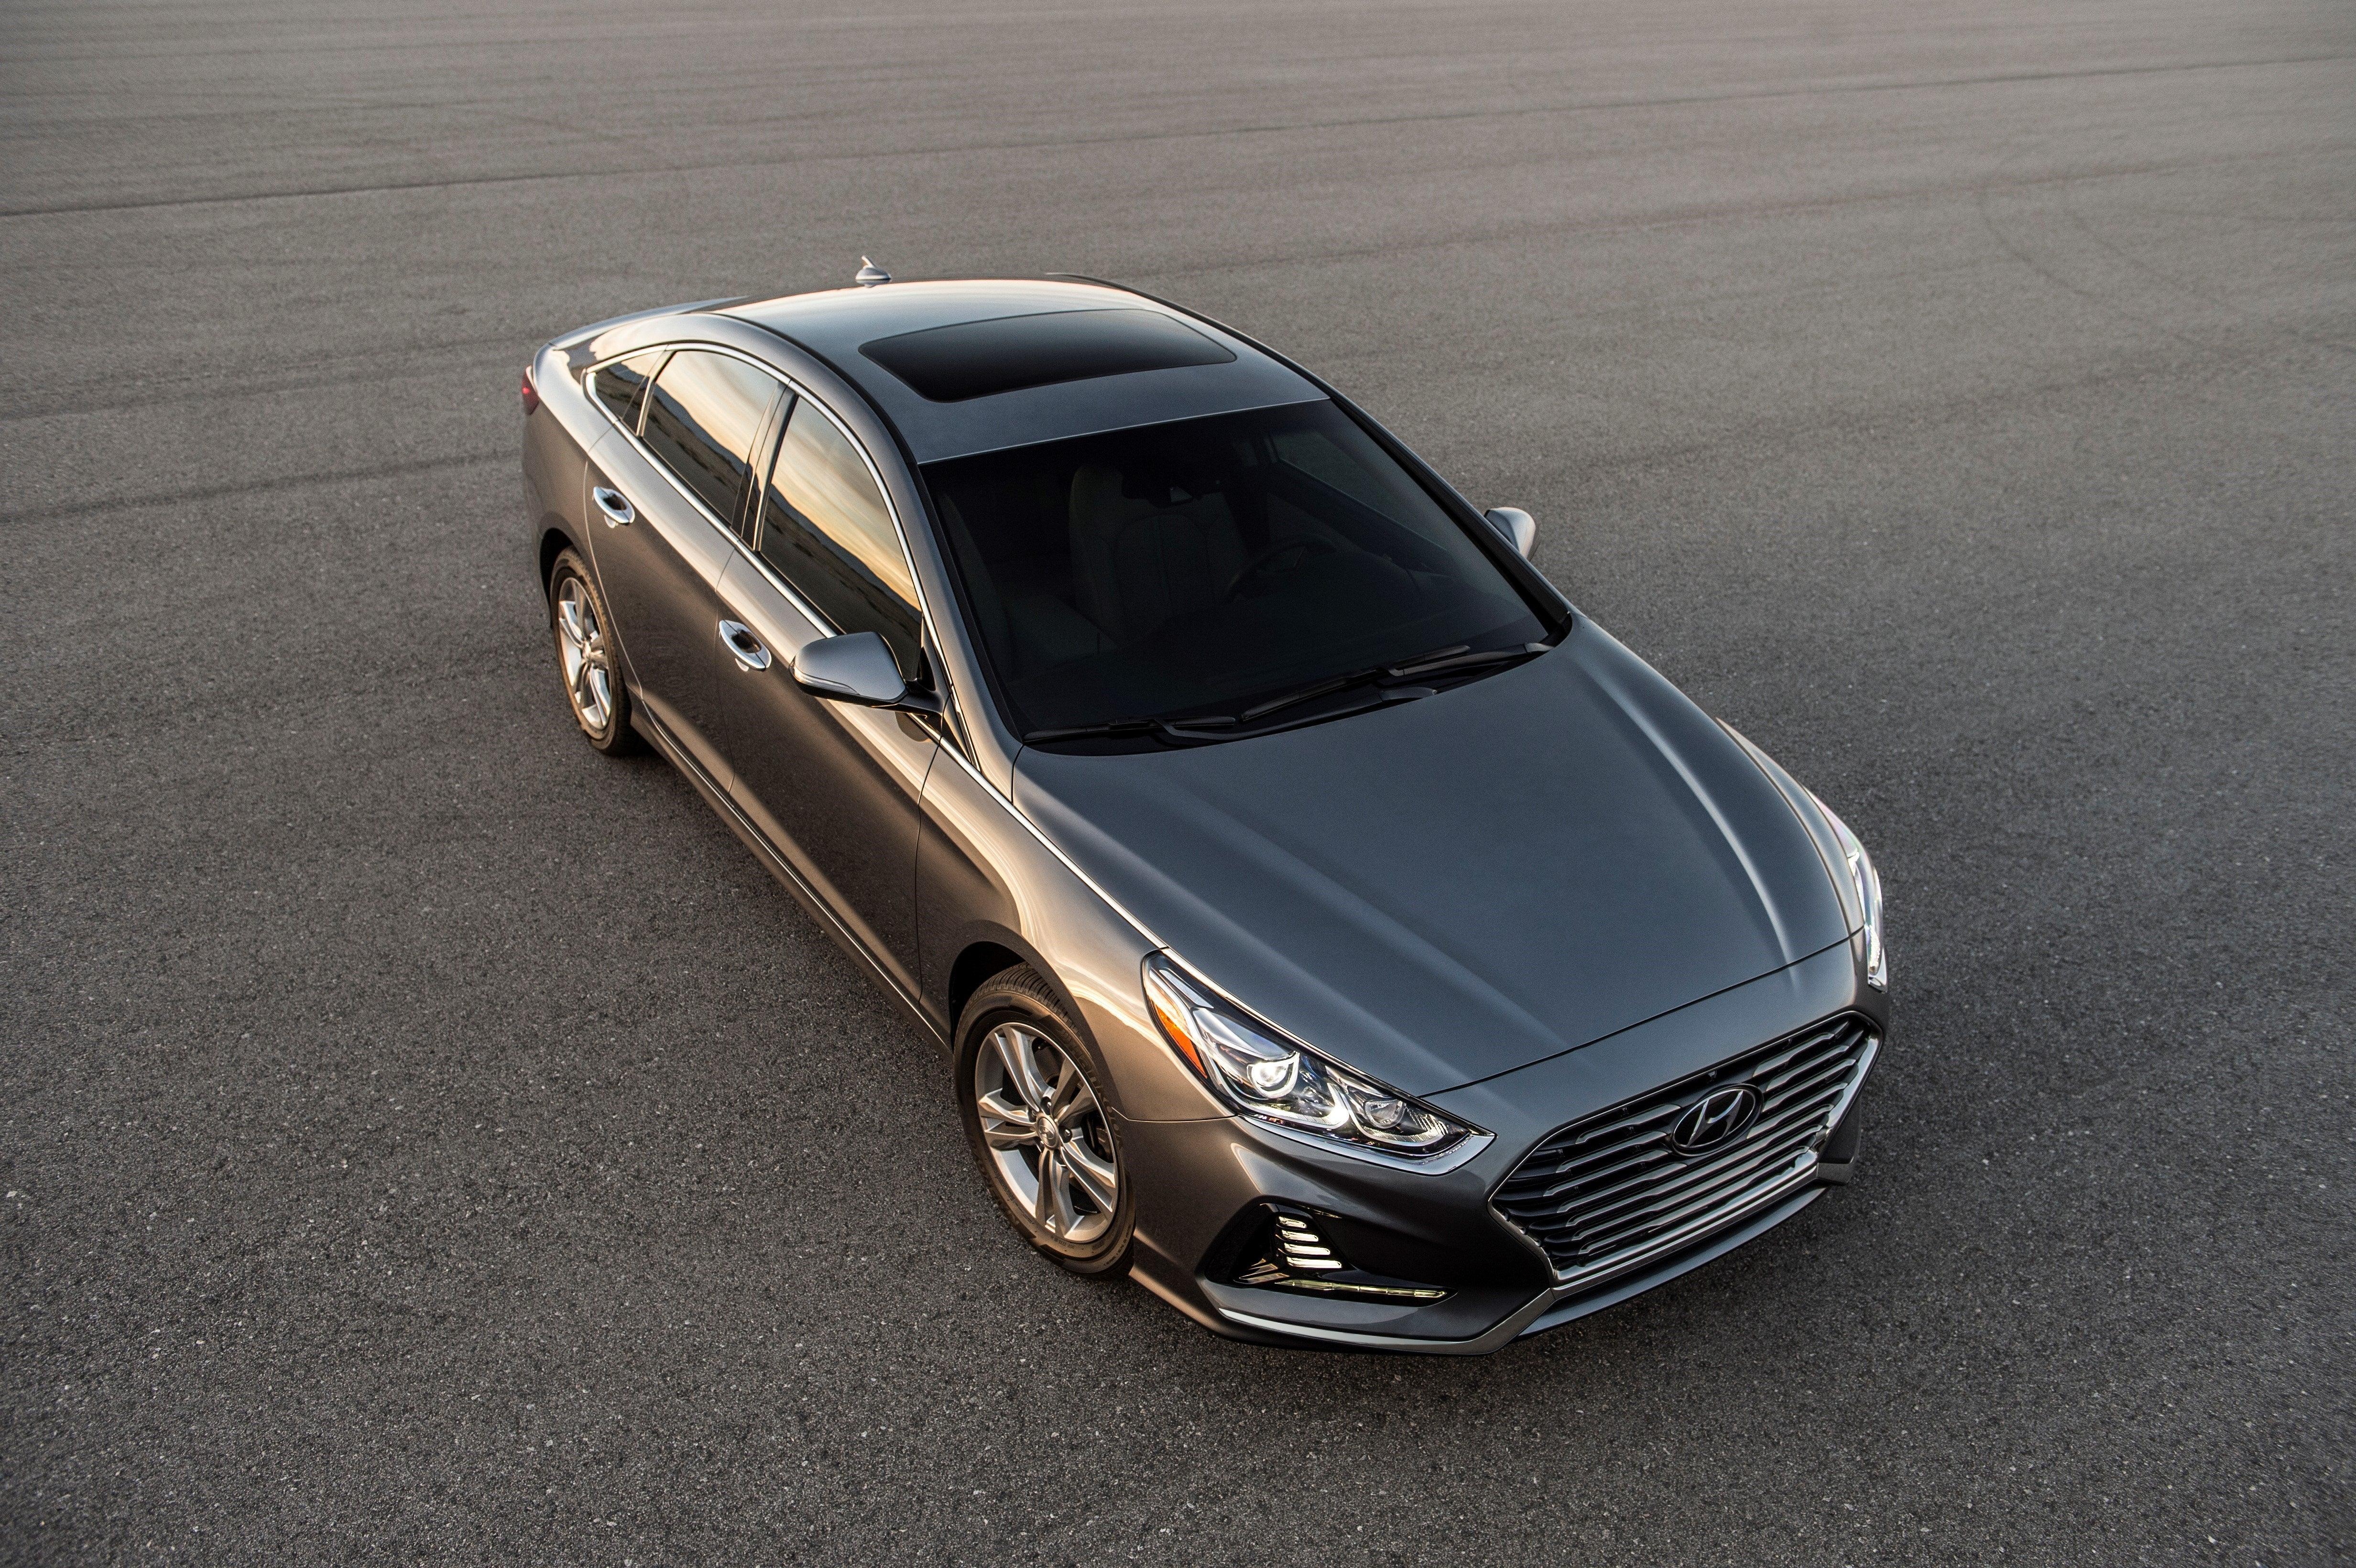 The 2018 Hyundai Sonata is a sensible family sedan   Boston com